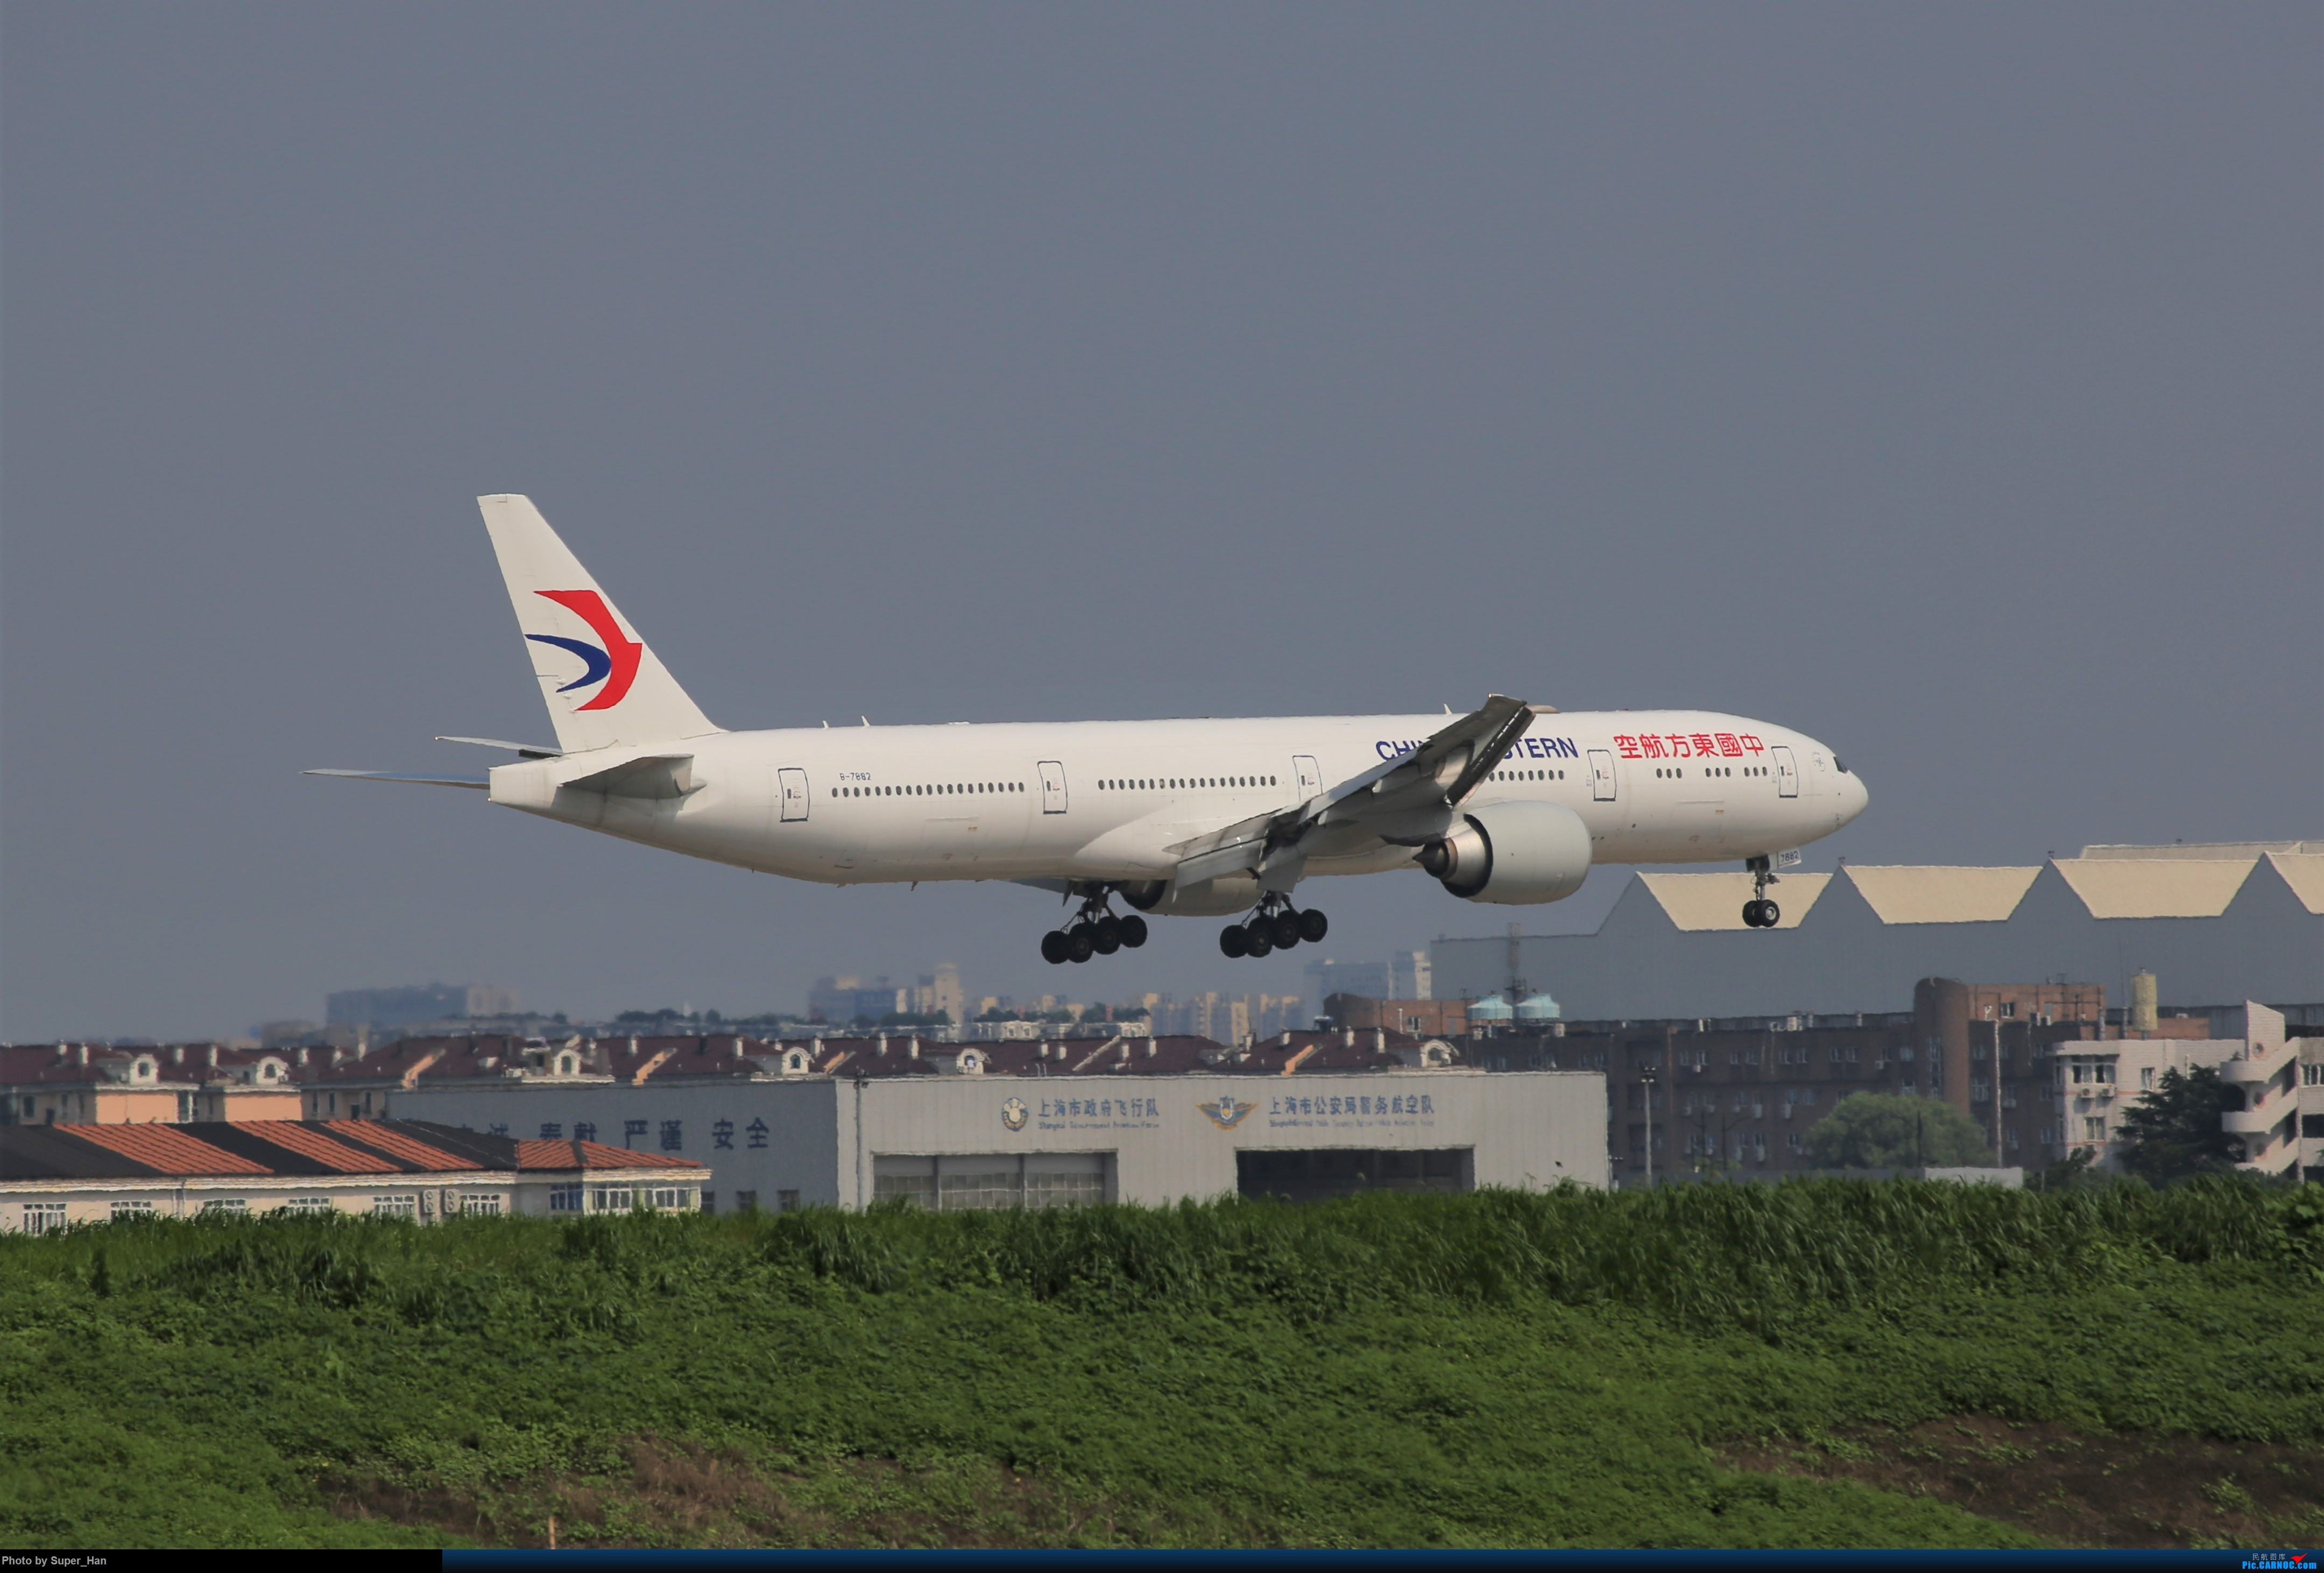 Re:[原创]【杭州飞友会】0715去虹桥说走就走【777篇】 BOEING 777-300ER B-7882 中国上海虹桥国际机场